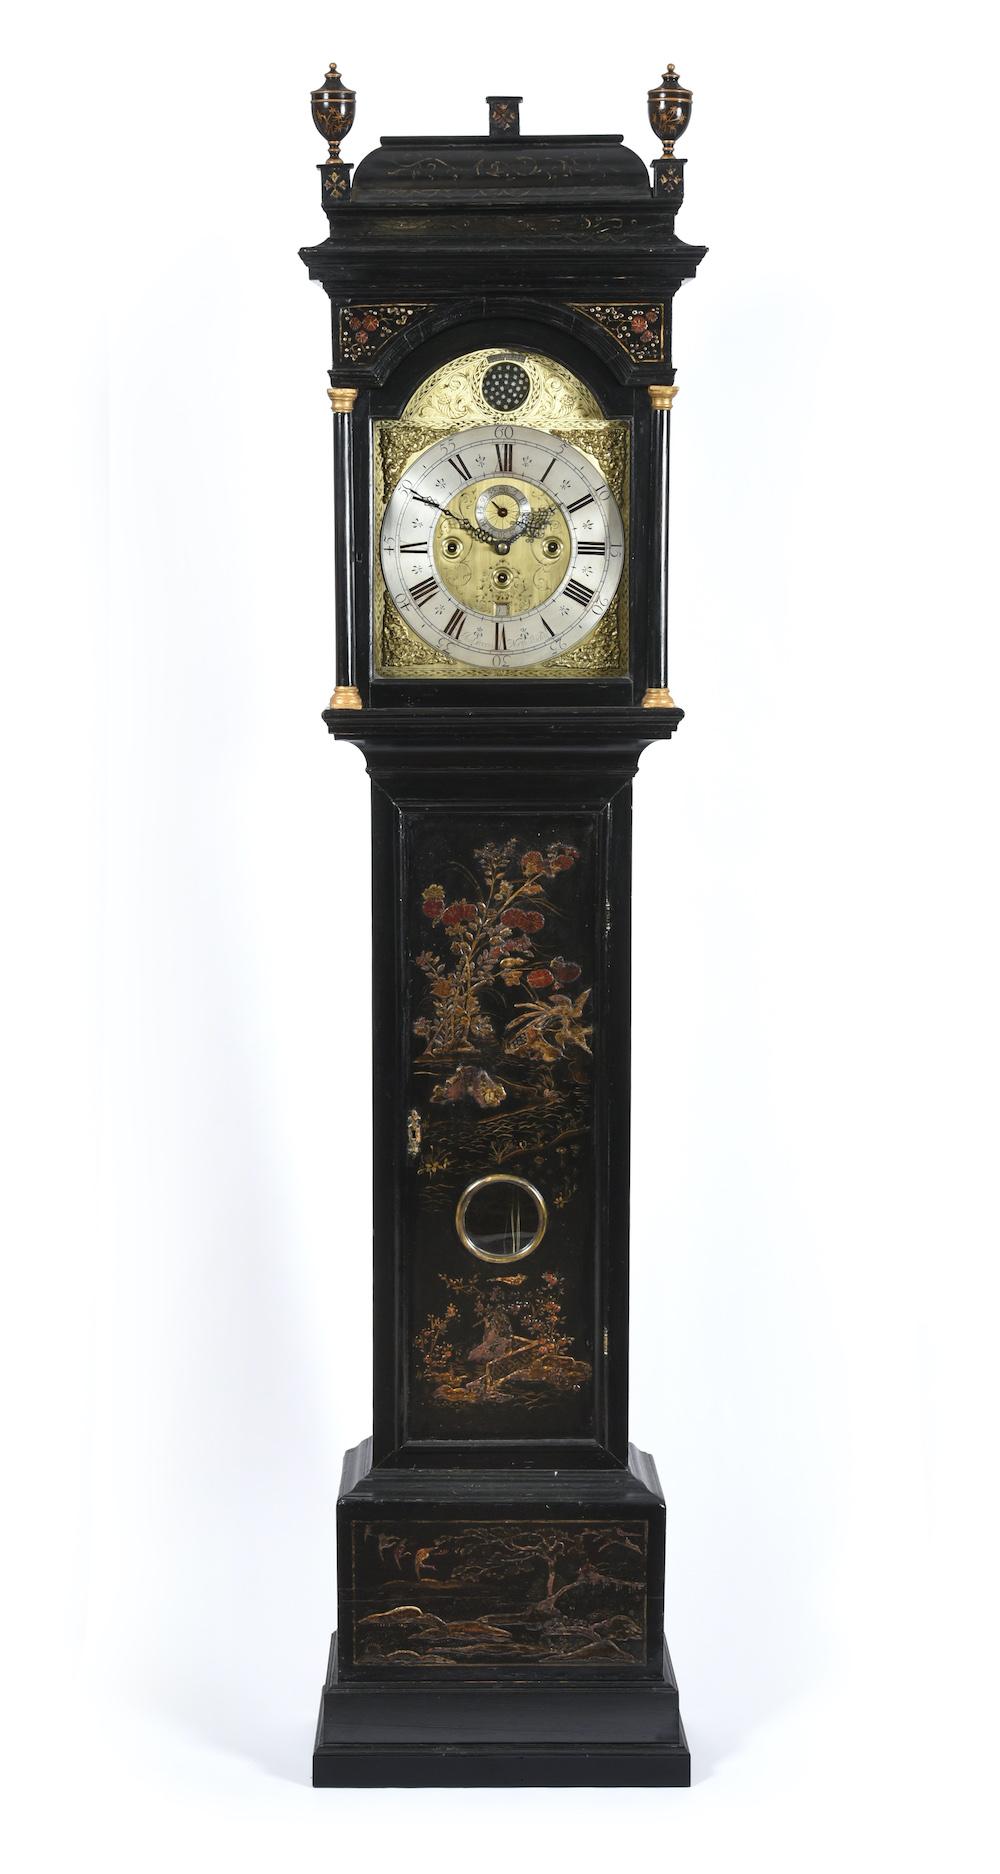 rare Chinoiserie quarter chiming longcase clock, signed Jos Green, North Shields, circa 1730